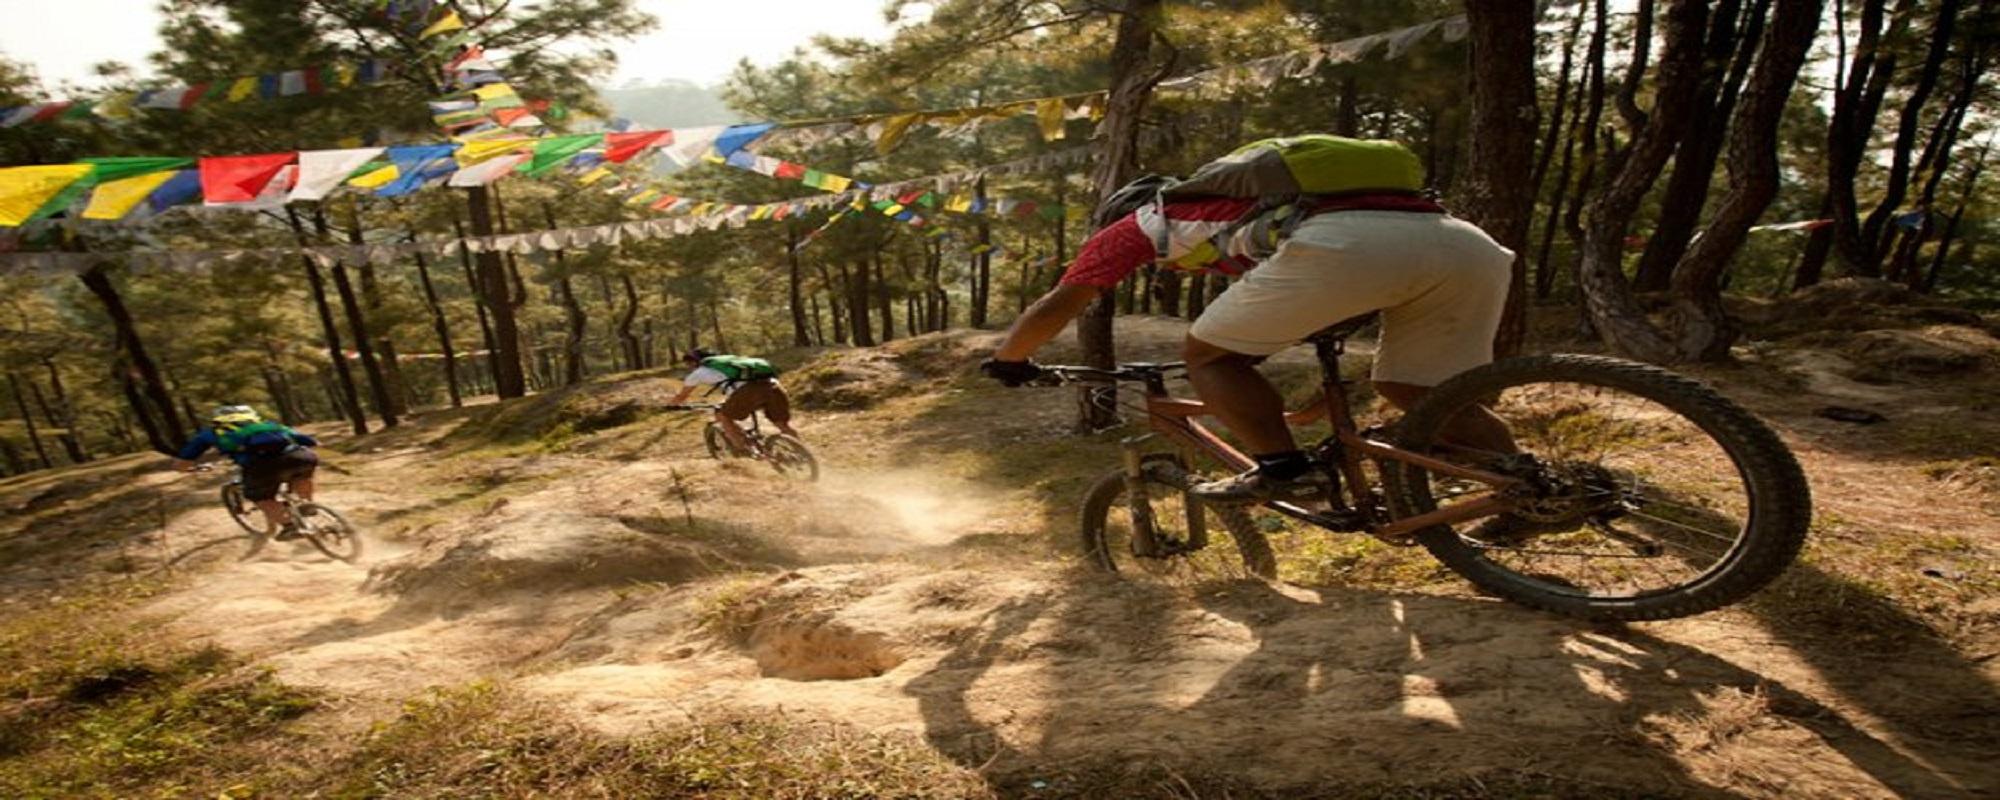 Kathmandu Mountain Bike Tours